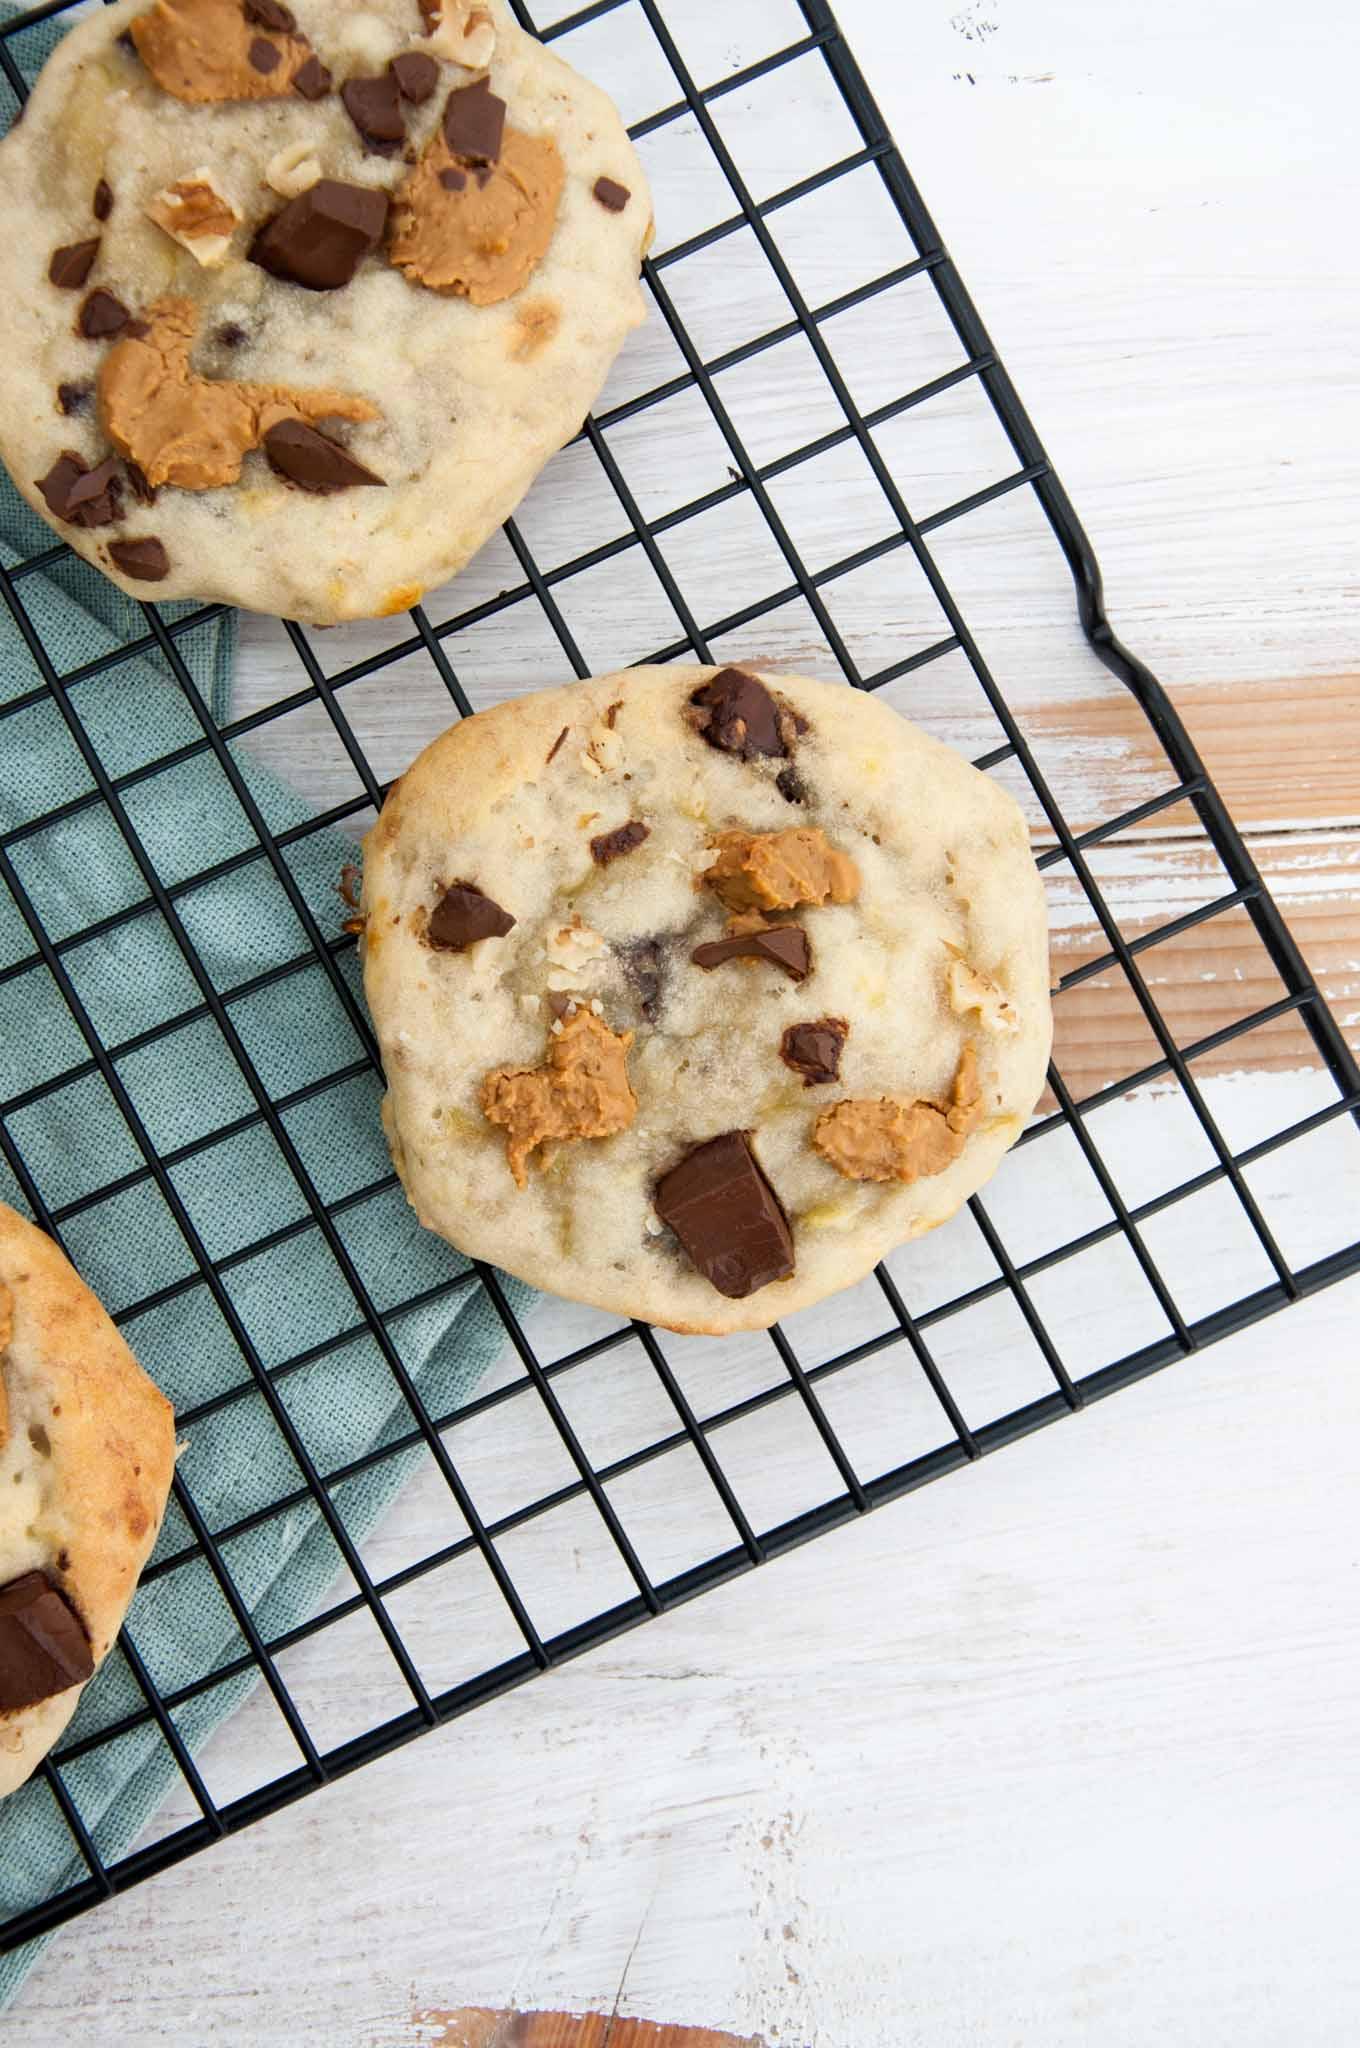 Chunky Monkey Cookies (Vegan, Oil-Free, Sugar-Free) on a cooling rack